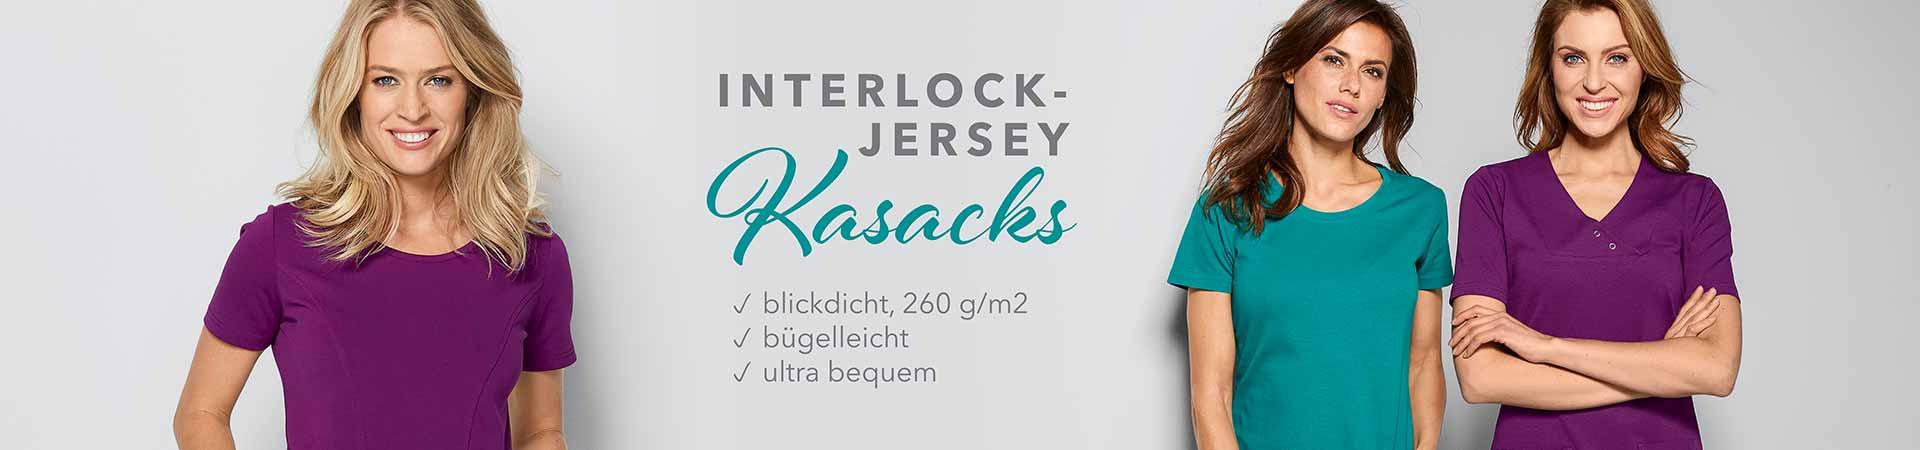 Interlock-Jersey Kasacks